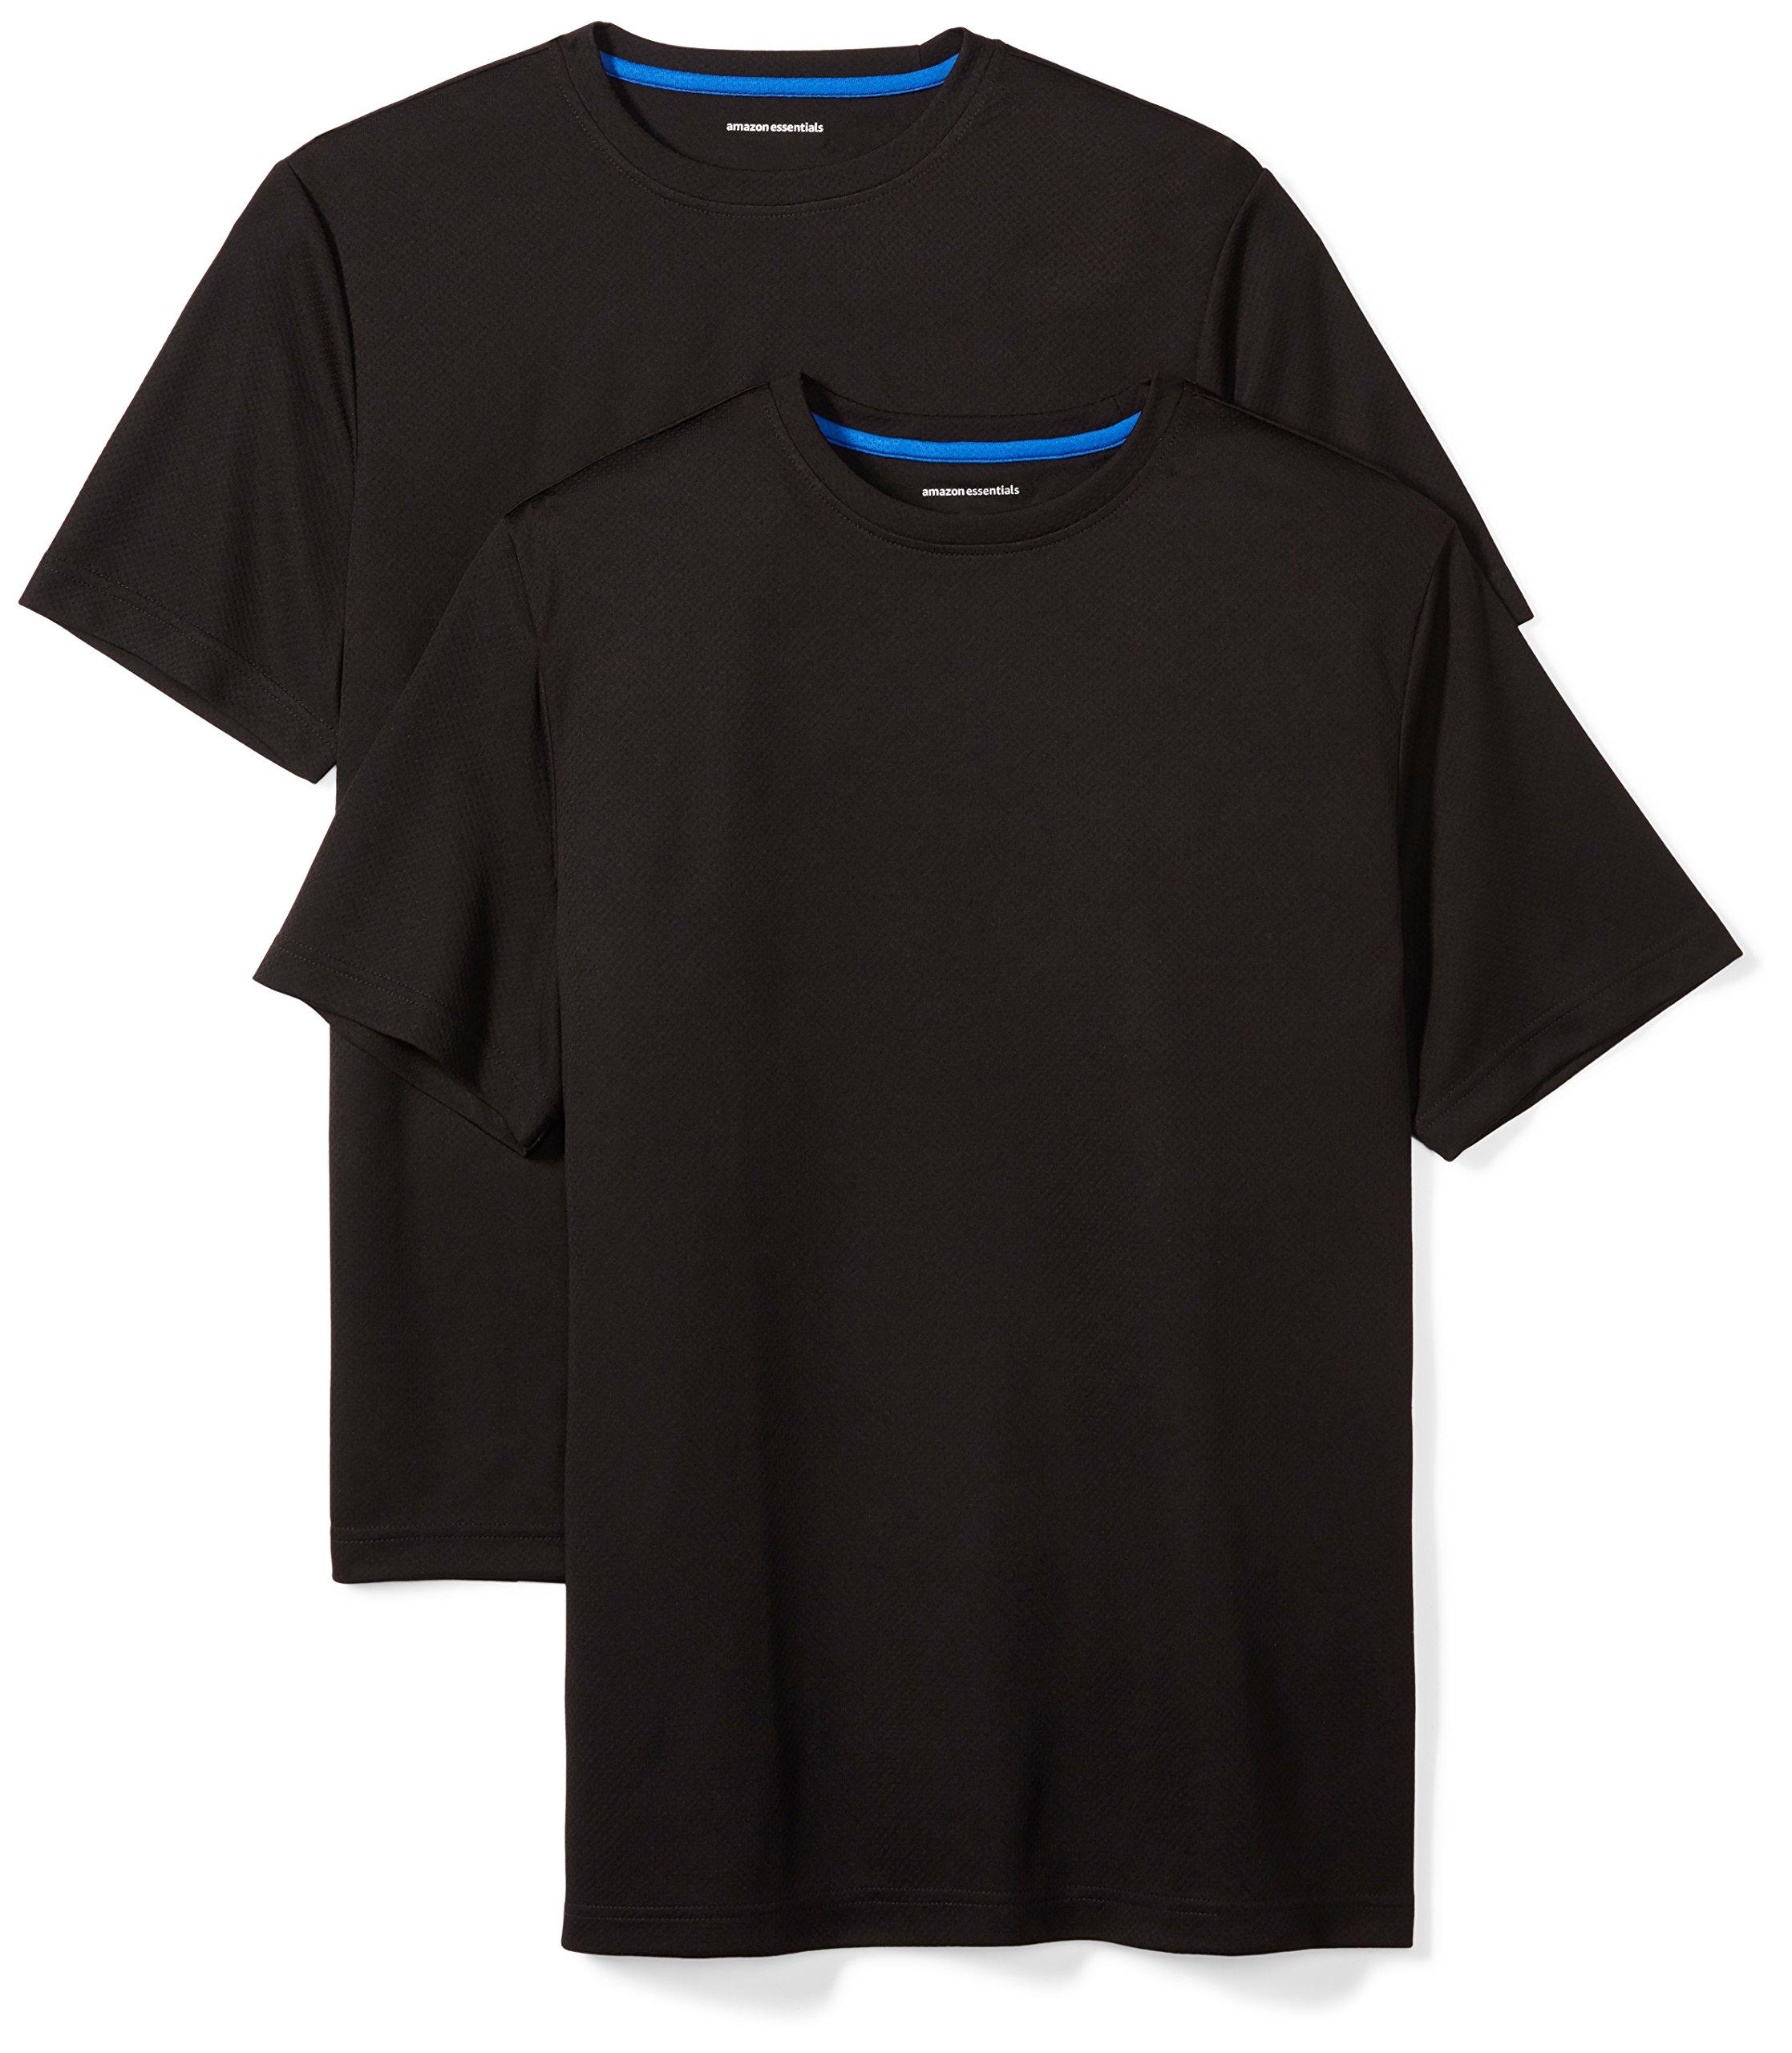 Amazon Essentials Men's 2-Pack Performance Short-Sleeve T-Shirts, Black/Black, Large